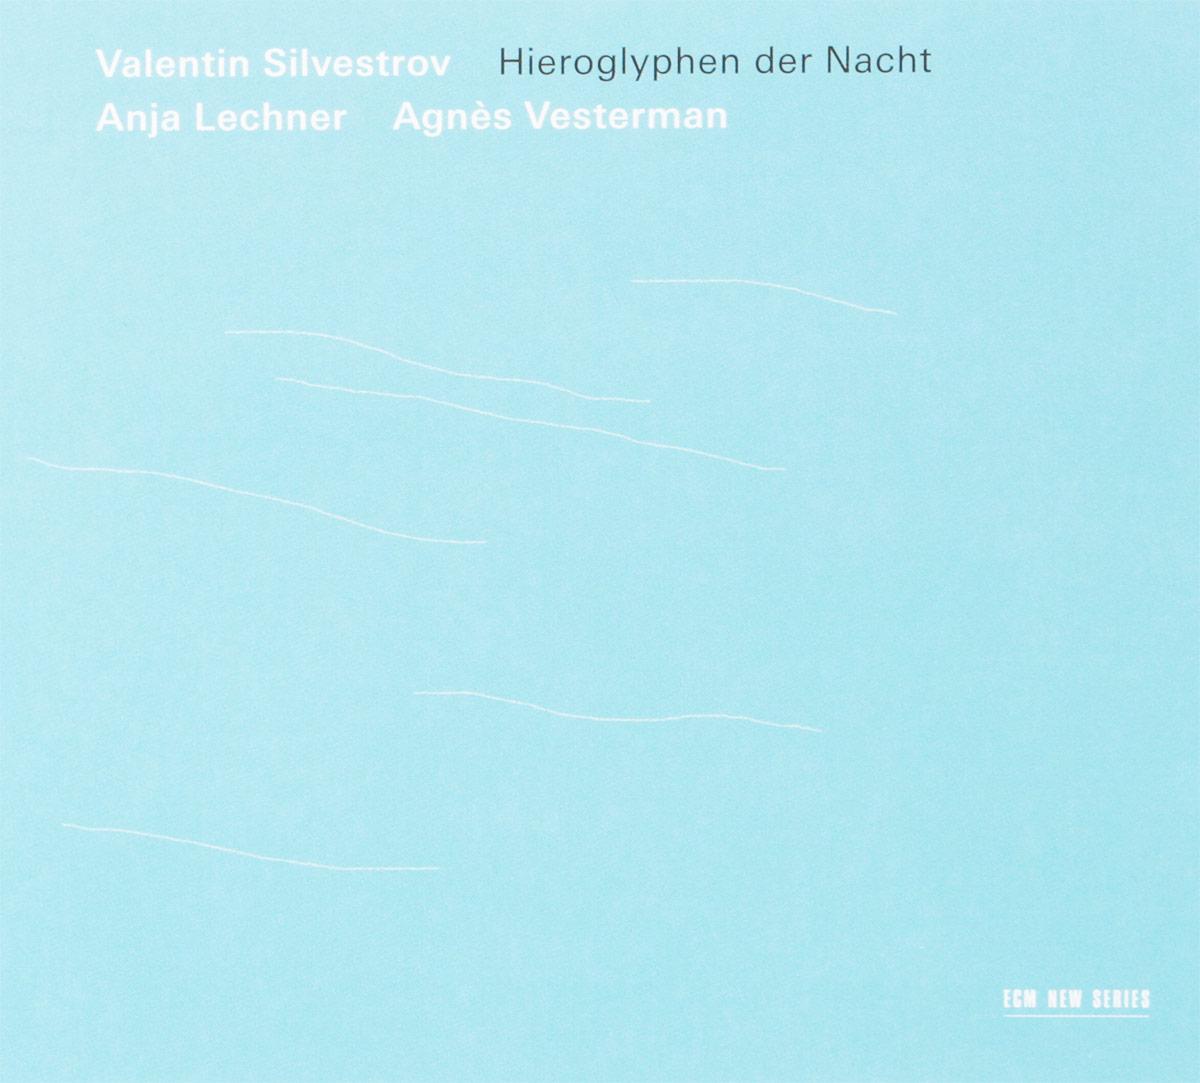 Валентин Сильвестров,Anja Lechner,Agnes Vesterman Anja Lechner, Agnes Vesterman, Valentin Silvestrov. Hieroglyphen Der Nacht